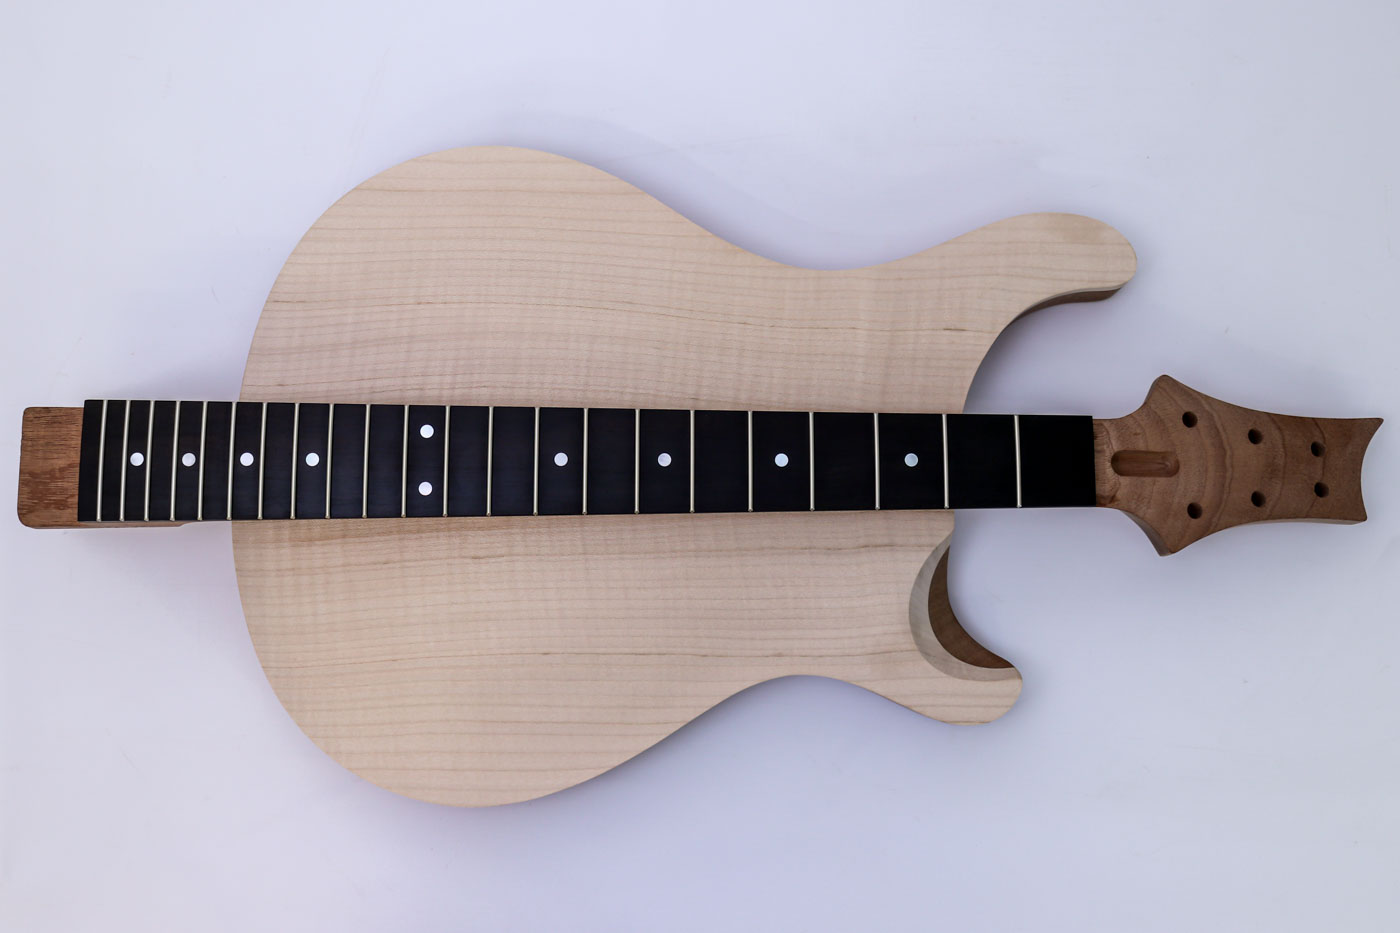 Guns-and-Guitars-Kit (1 of 19).jpg